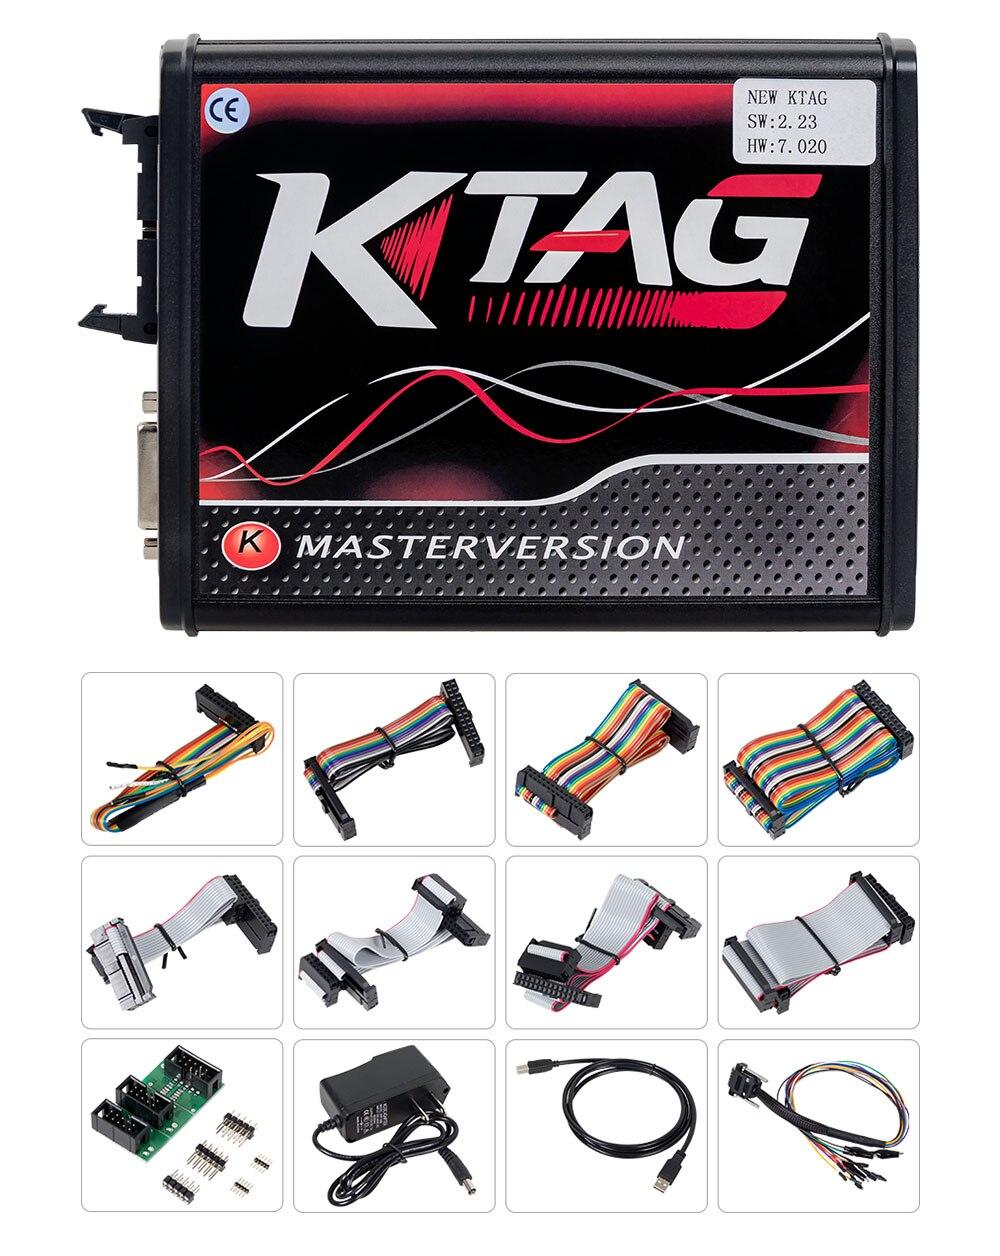 HTB1NgtUVgHqK1RjSZFEq6AGMXXa3 KESS V2 V5.017 full Online V2.47 Manager Tuning Kit KTAG V7.020 4 LED Master K-tag V2.25 KESS BDM Titanium Winols ECU programmer